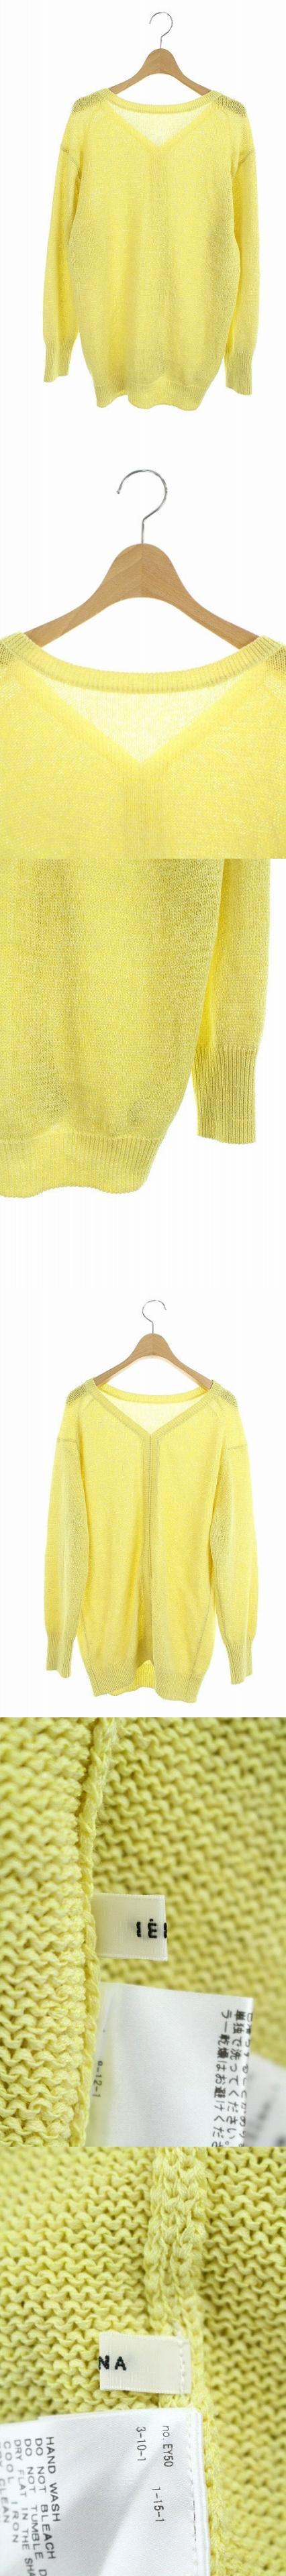 19SS ニット カットソー リネン混 テープヤーン バックデザイン 長袖 黄色 /AO ■OS